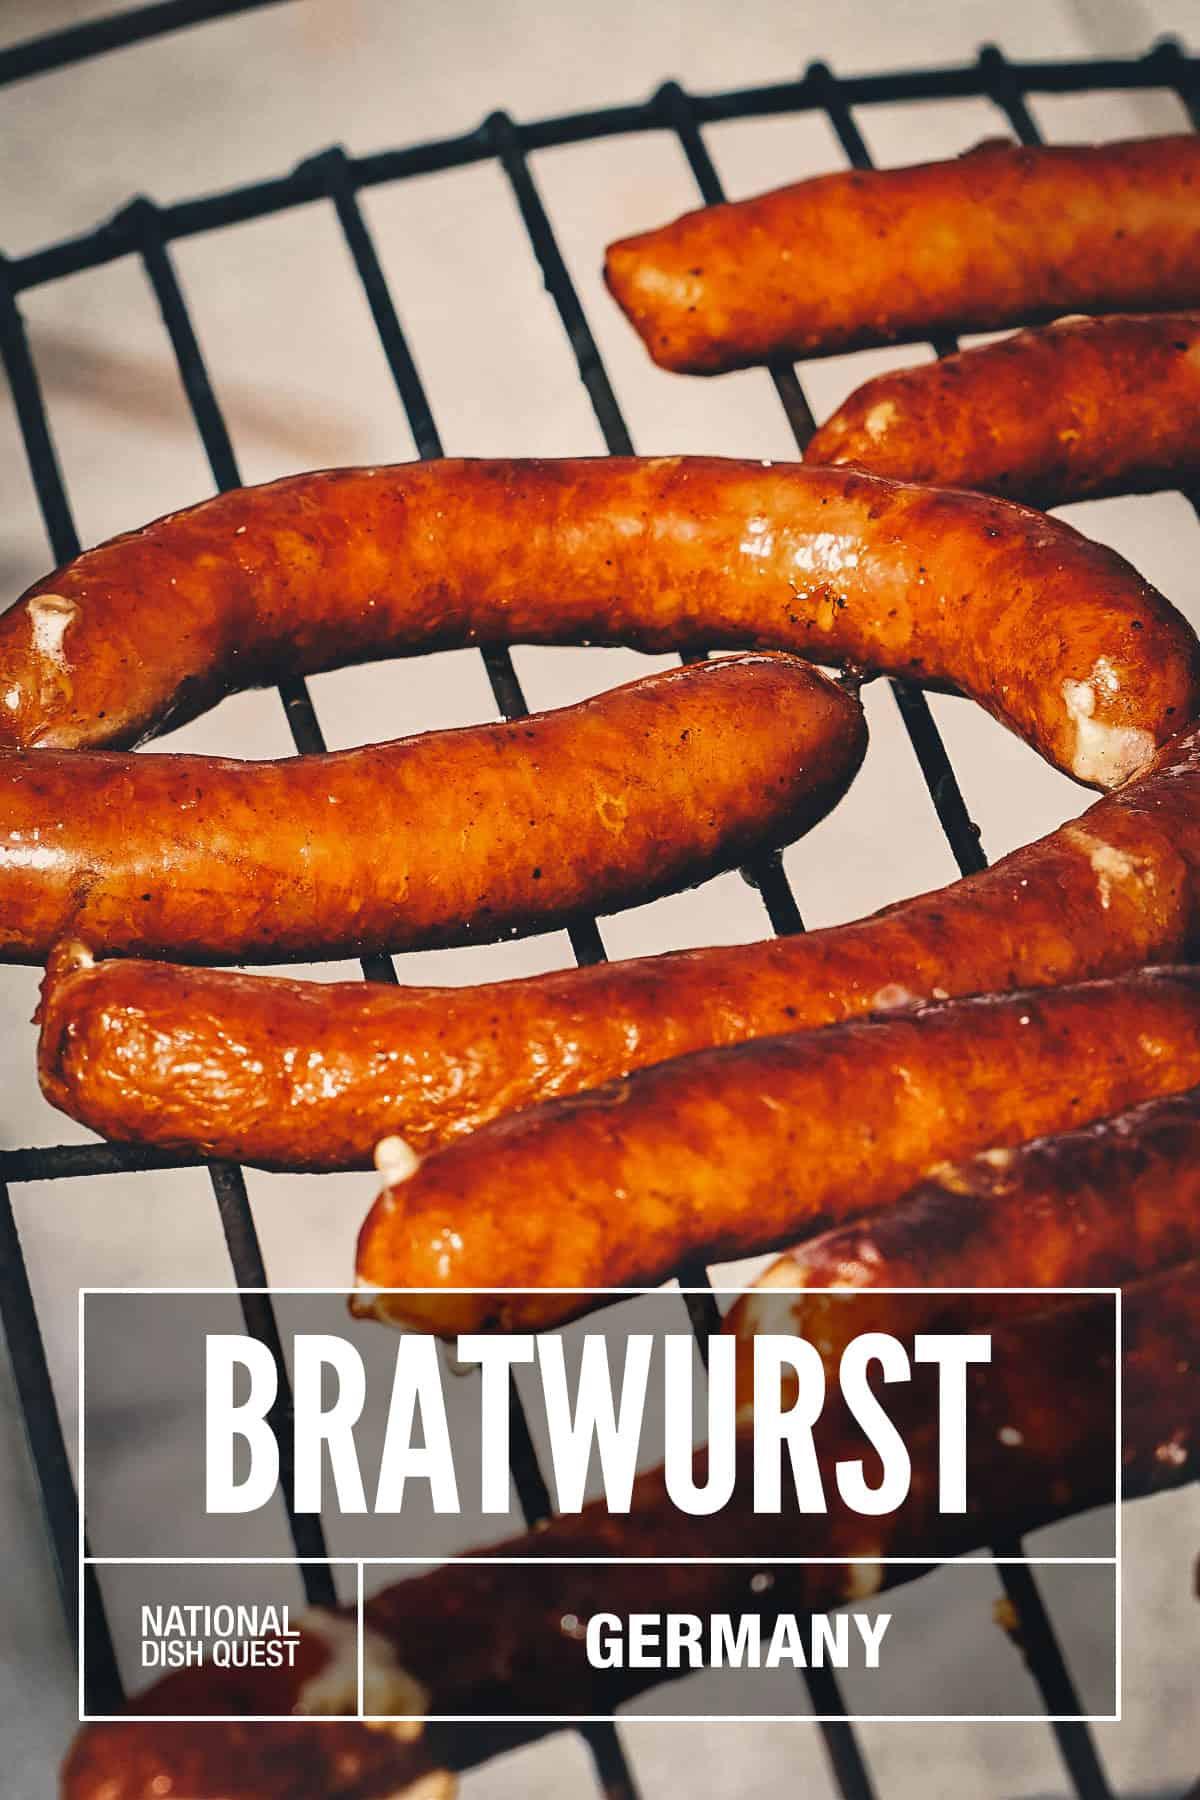 Bratwursts grilling